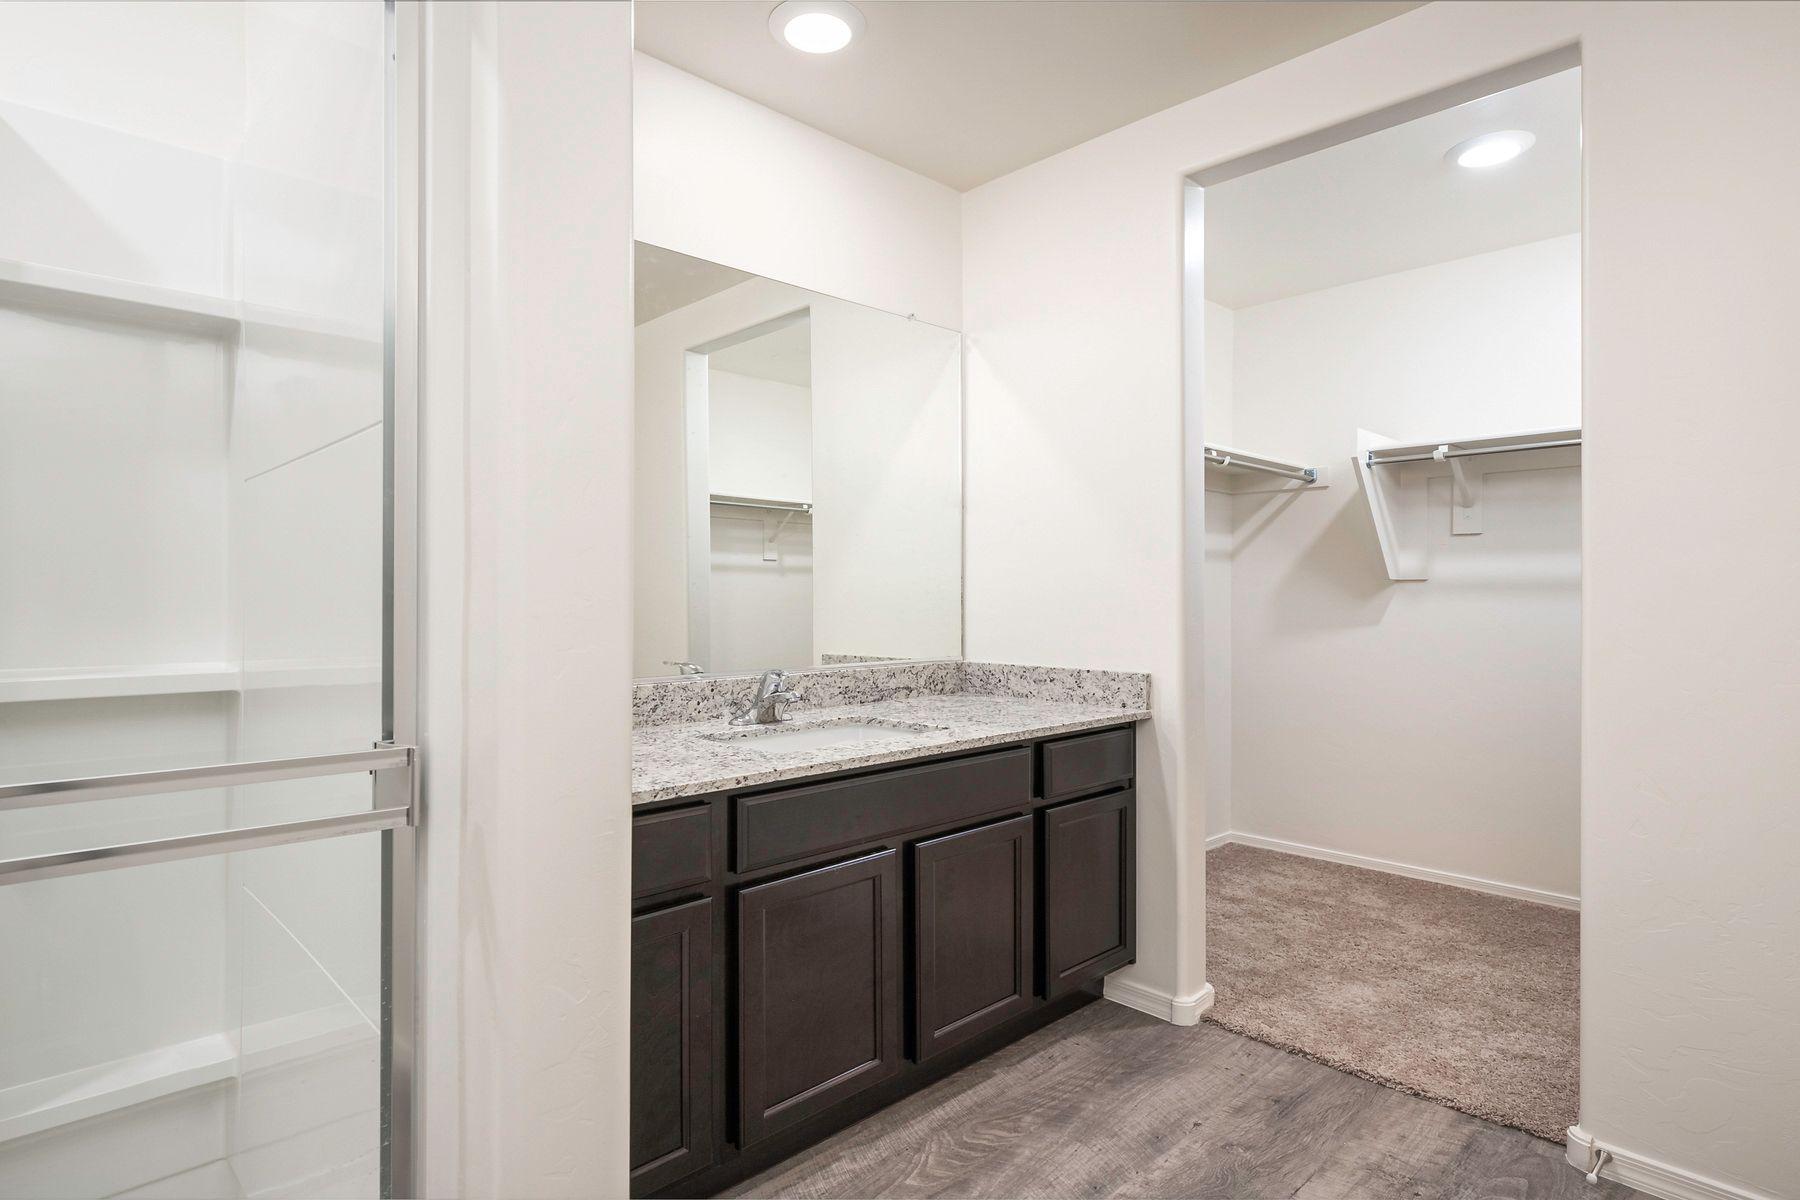 Bathroom featured in the Luna By LGI Homes in Tucson, AZ